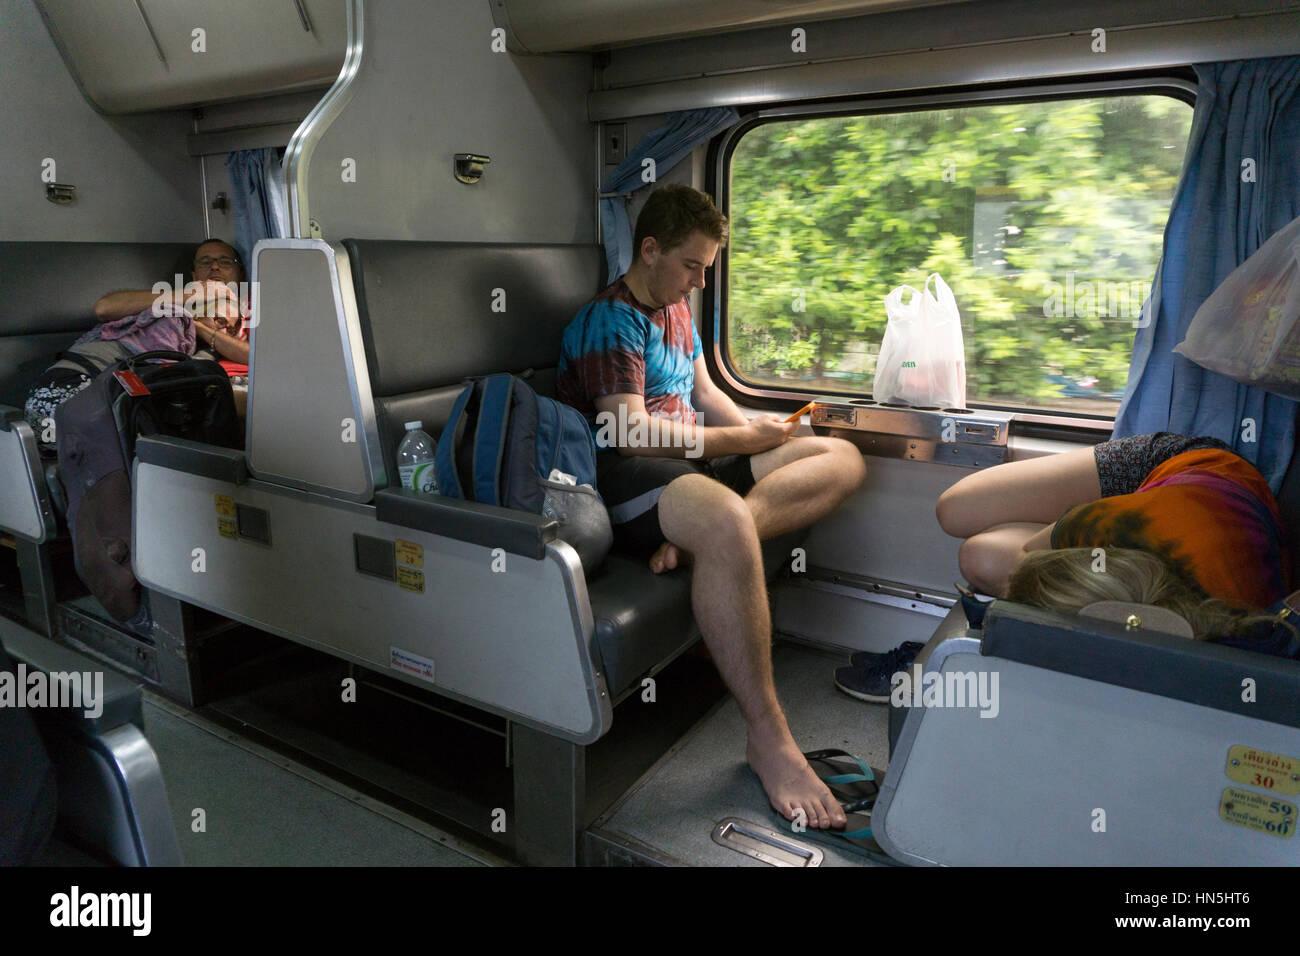 Travellers on the sleeper train between Chiang Mai and Bangkok - Stock Image